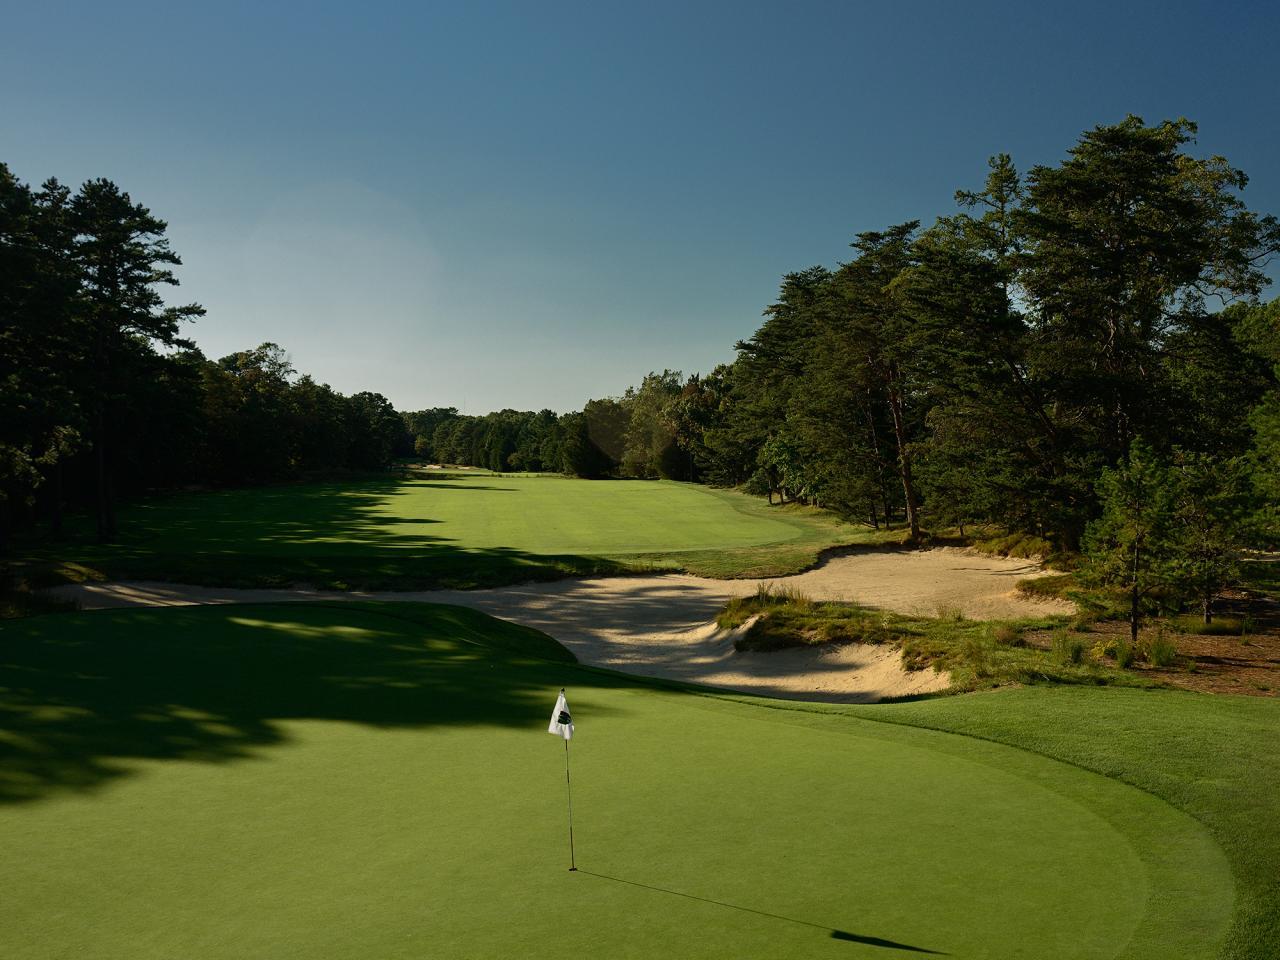 Pine Valley Golf Club Course Review & Photos   Courses ...